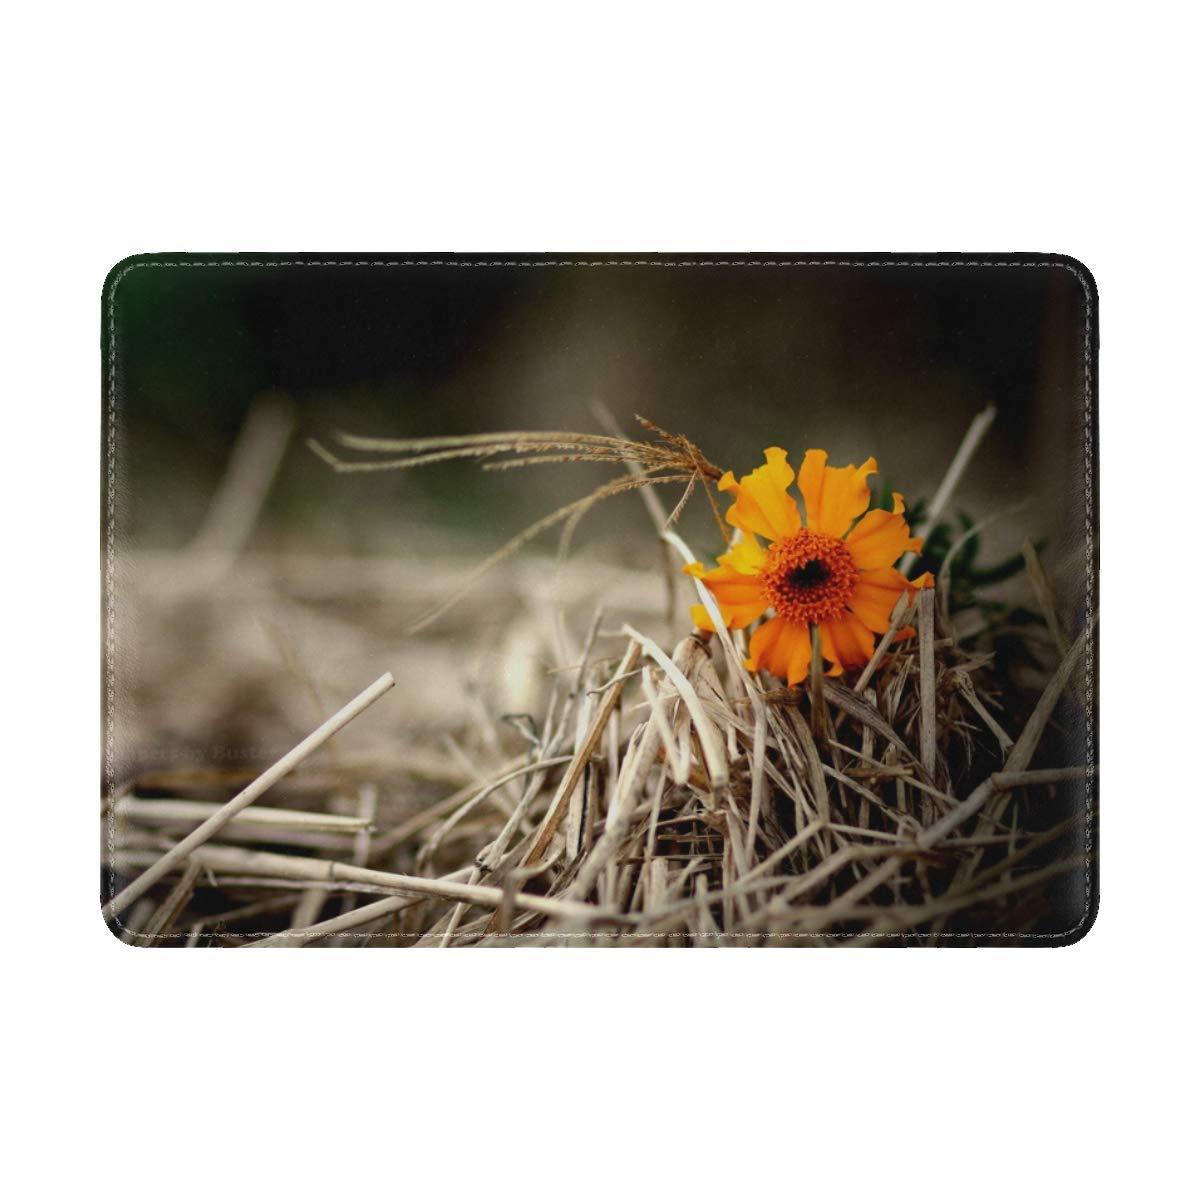 Flower Bright Hay Straw Leather Passport Holder Cover Case Travel One Pocket